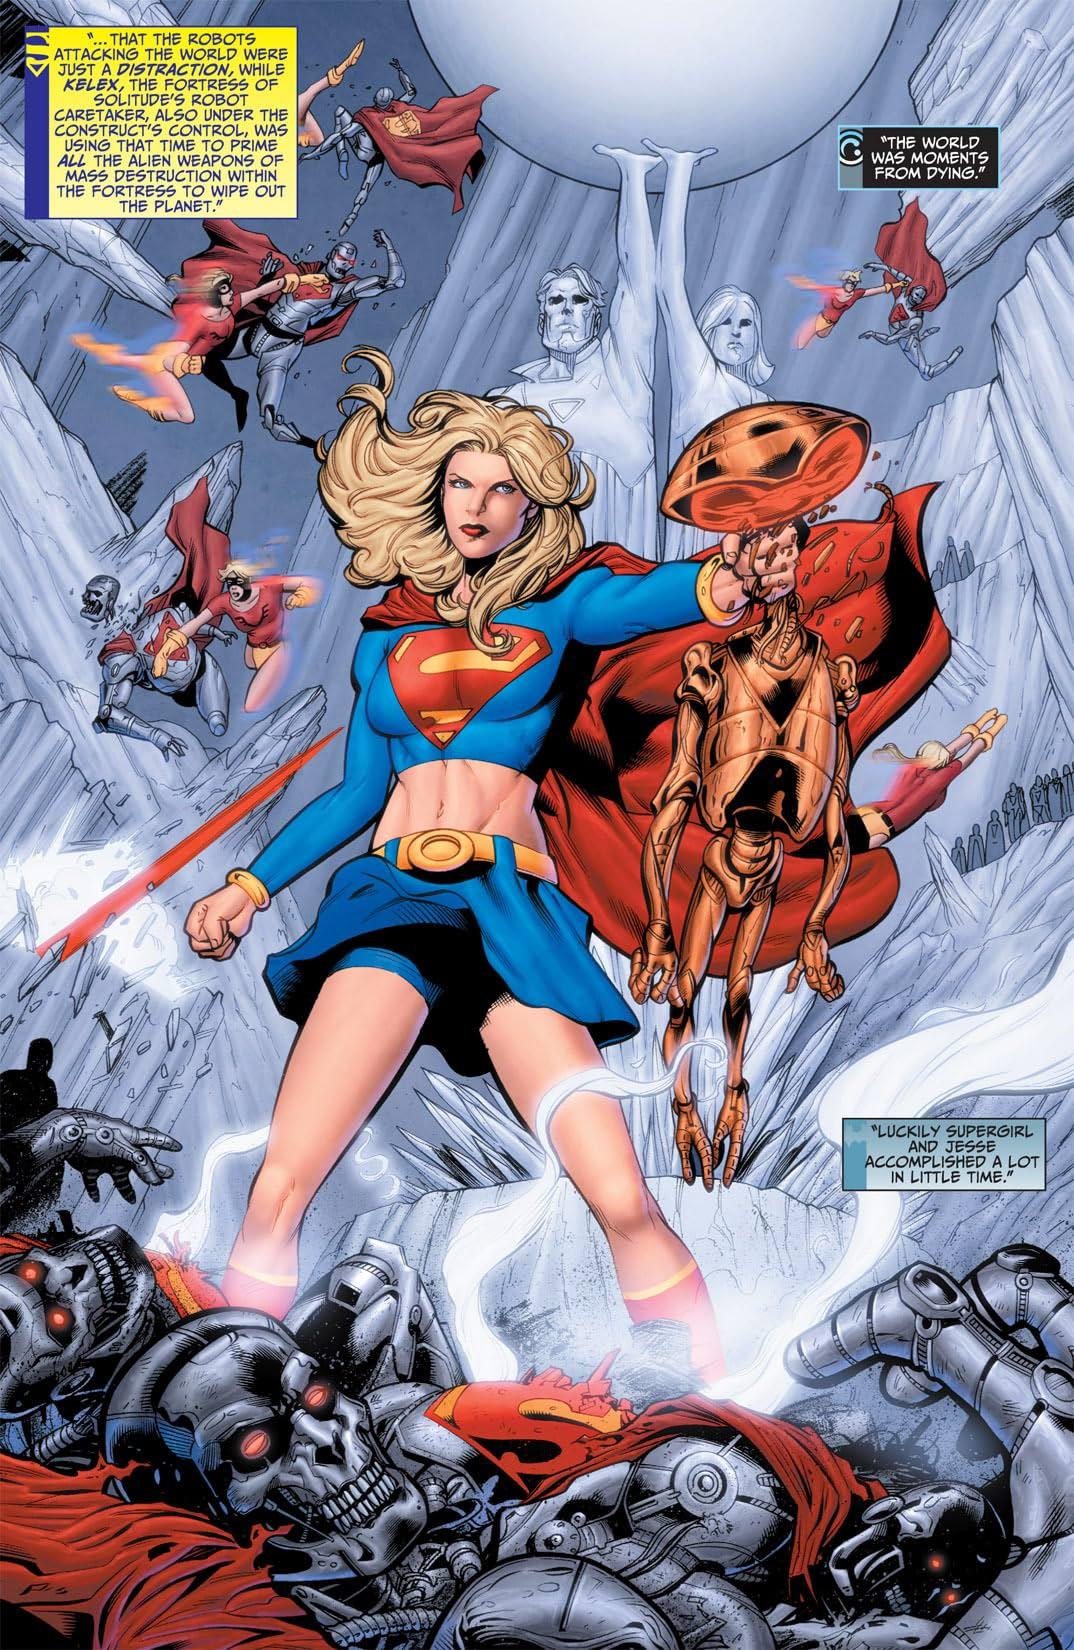 Justice League of America (2006-2011) #60